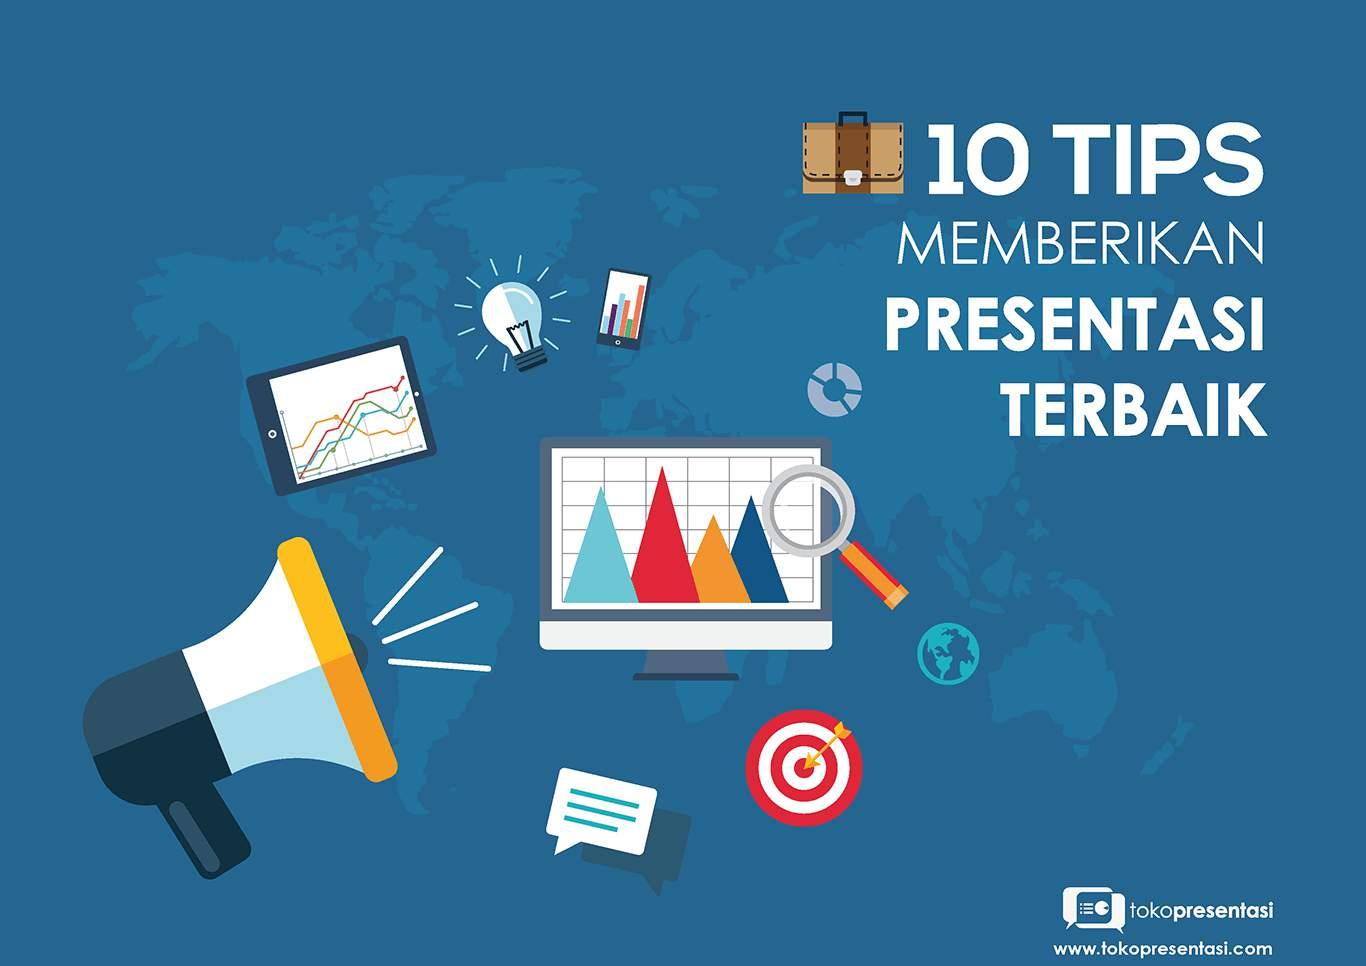 post 10 tips memberikan presentasi terbaik jasa ppt jasa powerpoint tokopresentasi jasa desain ppt_compressed